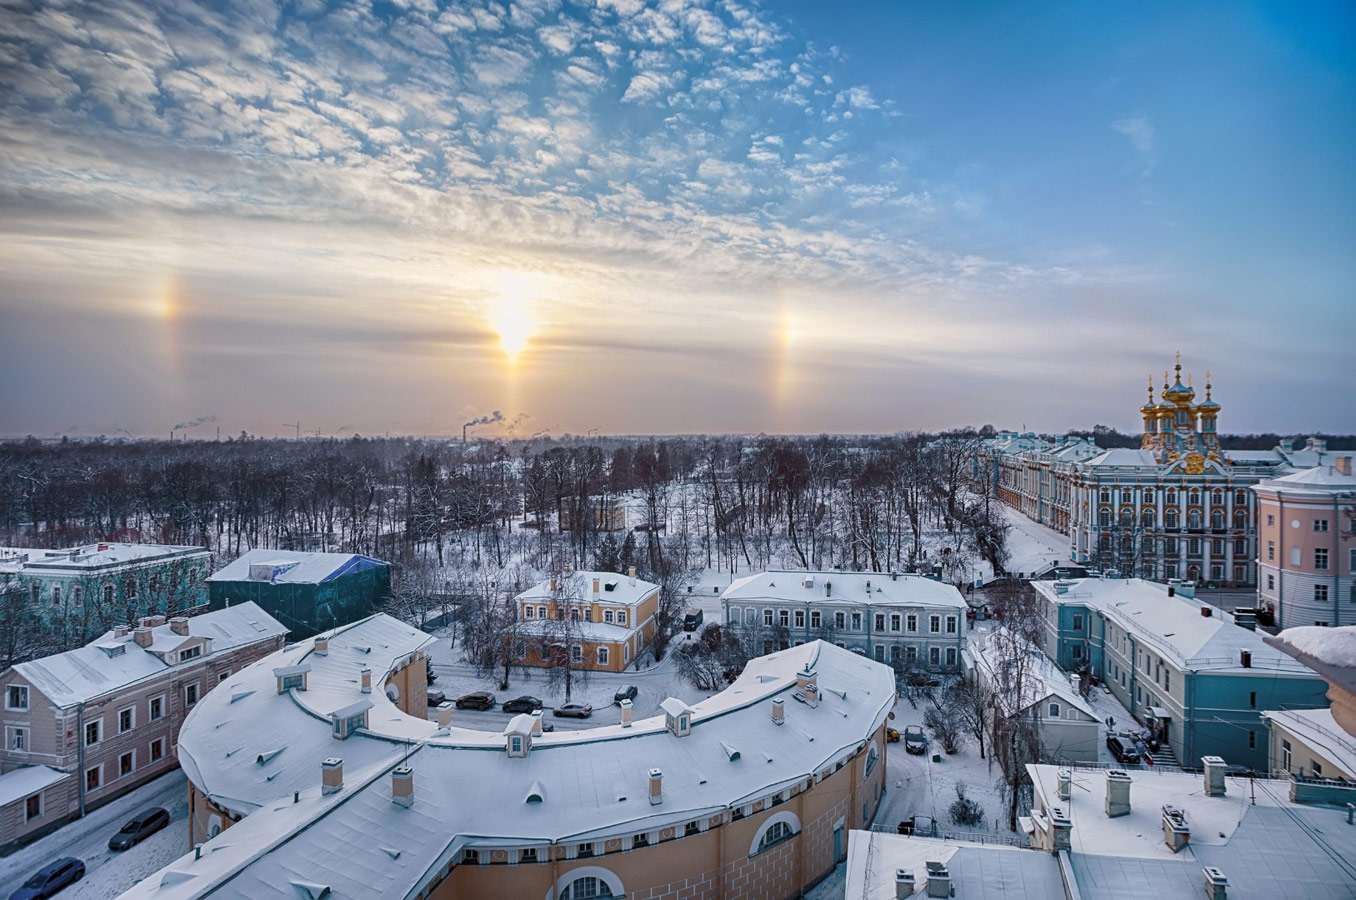 Александр Казакевич / Aleksandr Kazakevich, Фотоконкурс RMetS / RPS Weather